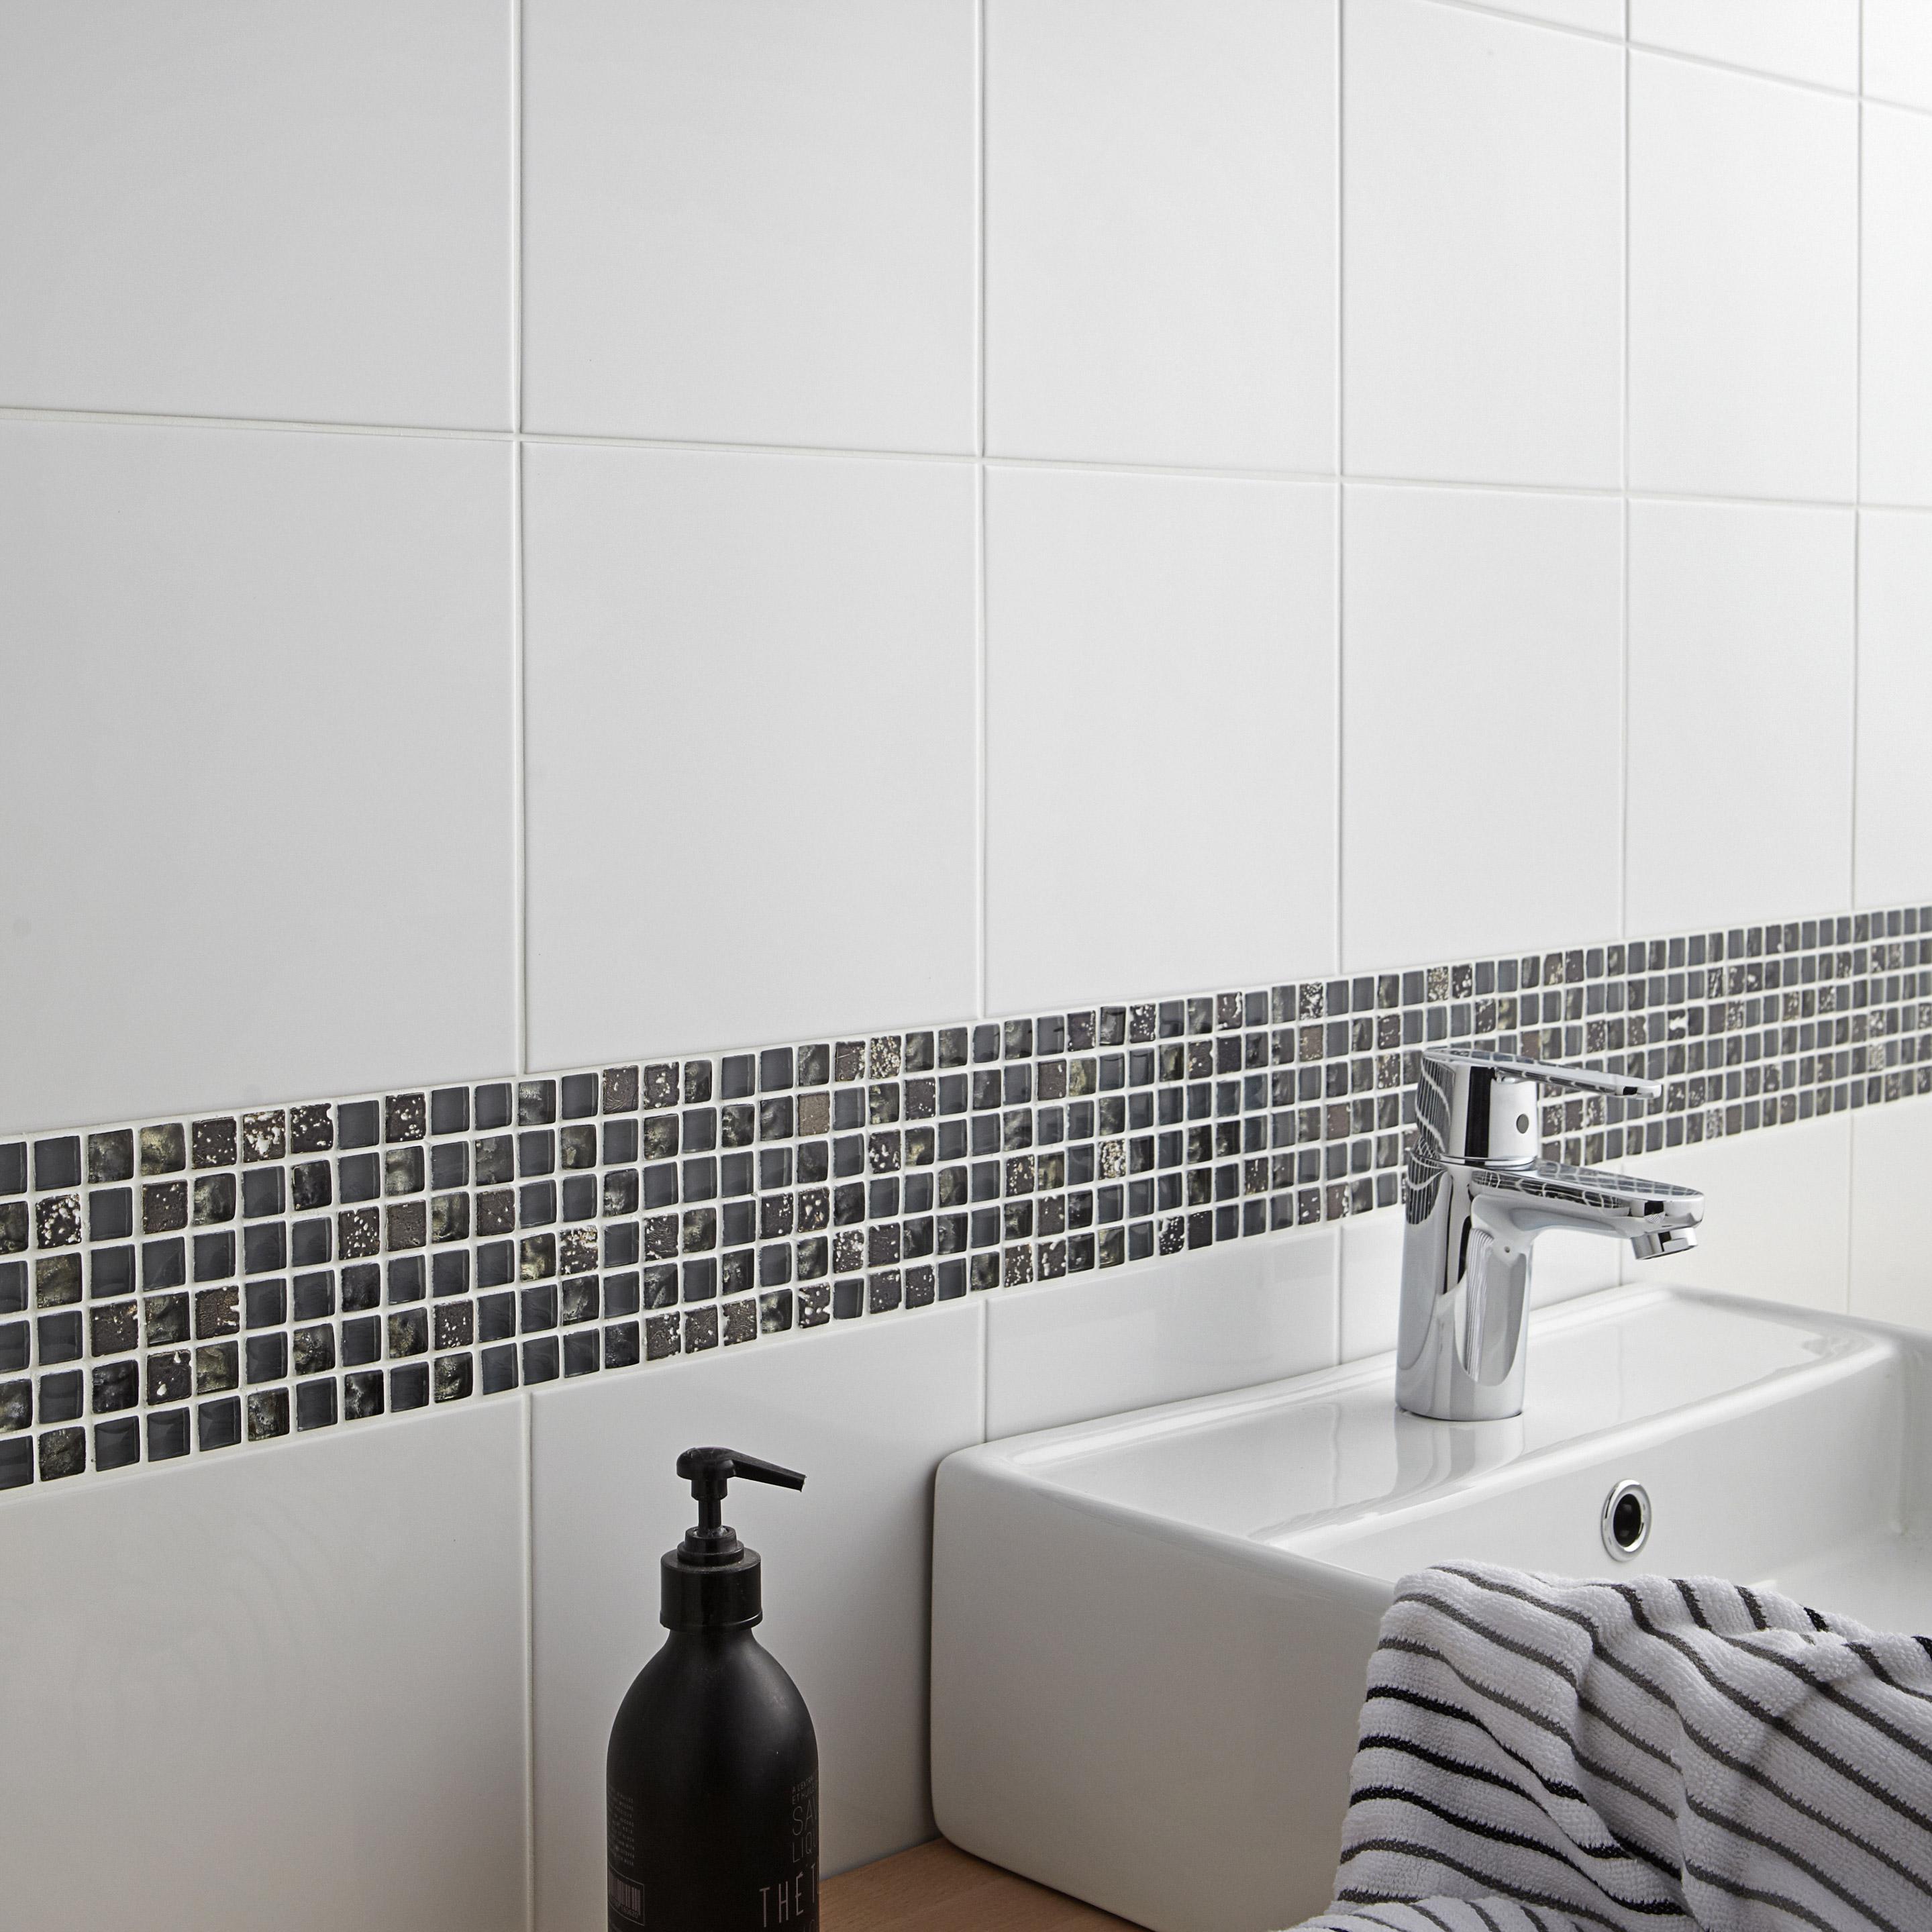 Faïence Mur Blanc Brillante L.20 X L.20 Cm, Basic